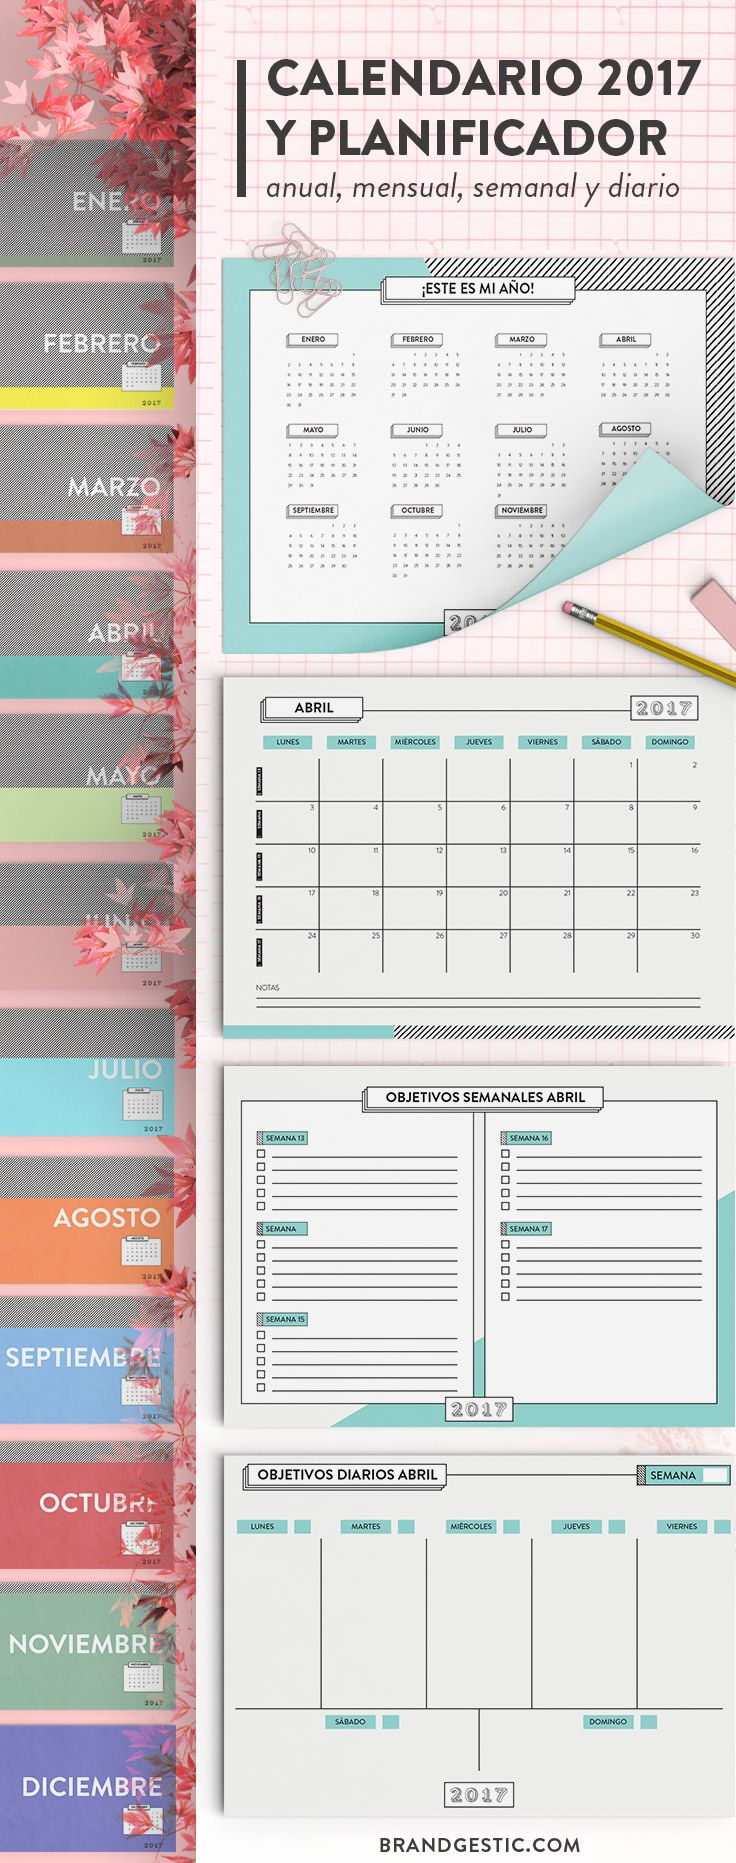 Planificador año completo 2017 imprimible con calendario en A3